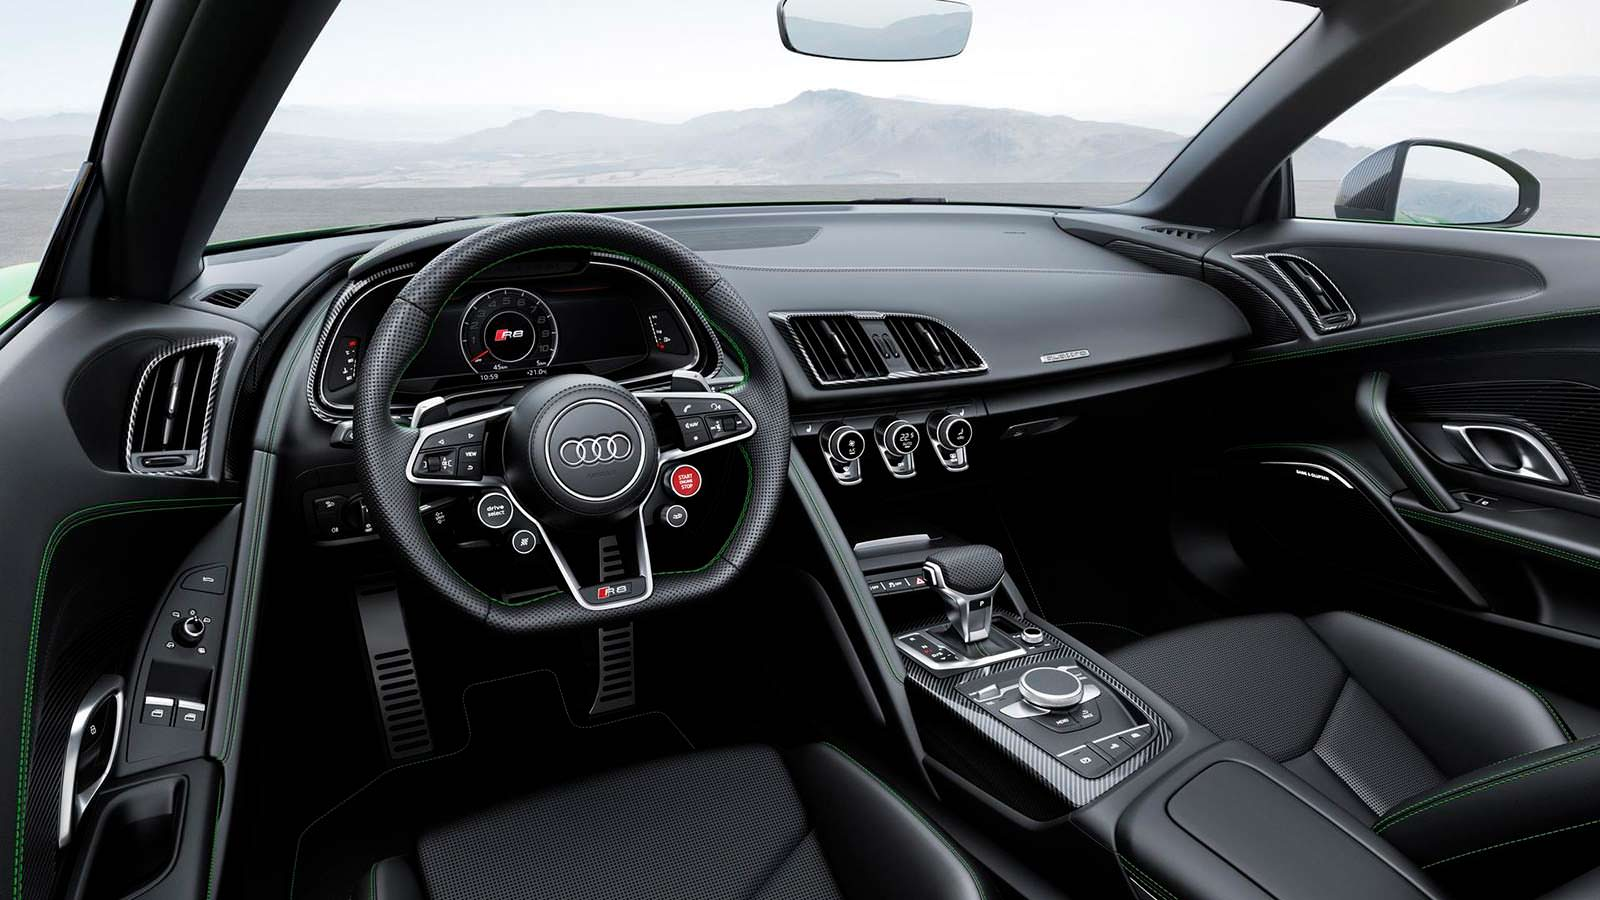 Фото салона Audi R8 Spyder V10 Plus 2017